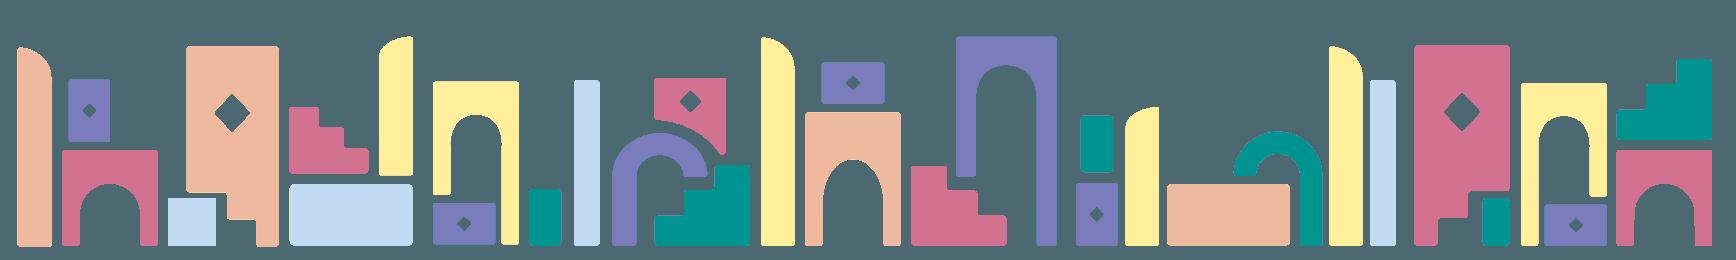 Blocs de construction colorés